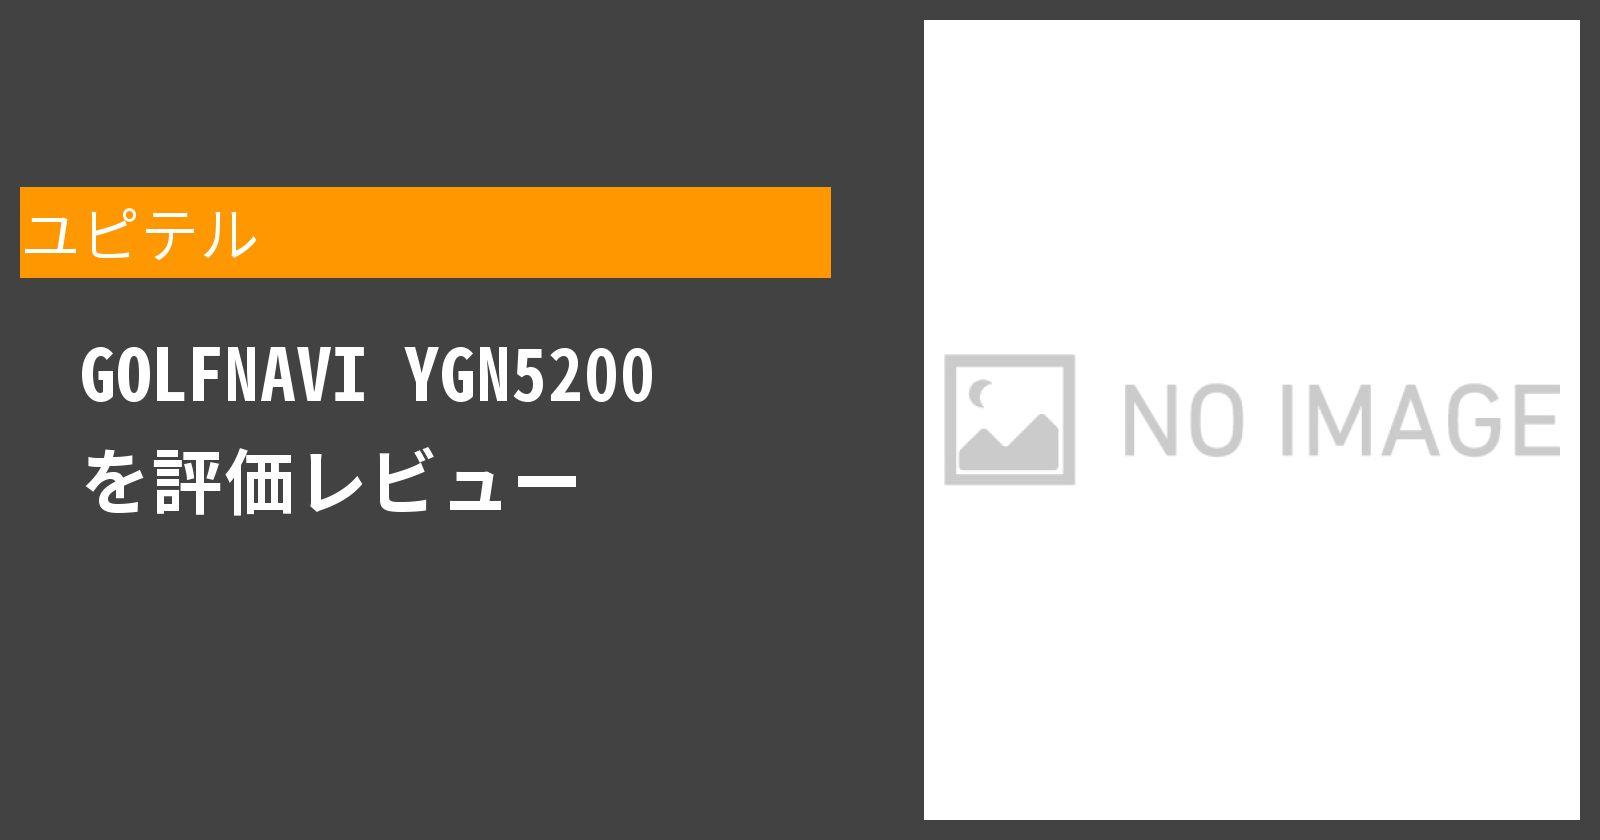 GOLFNAVI YGN5200を徹底評価